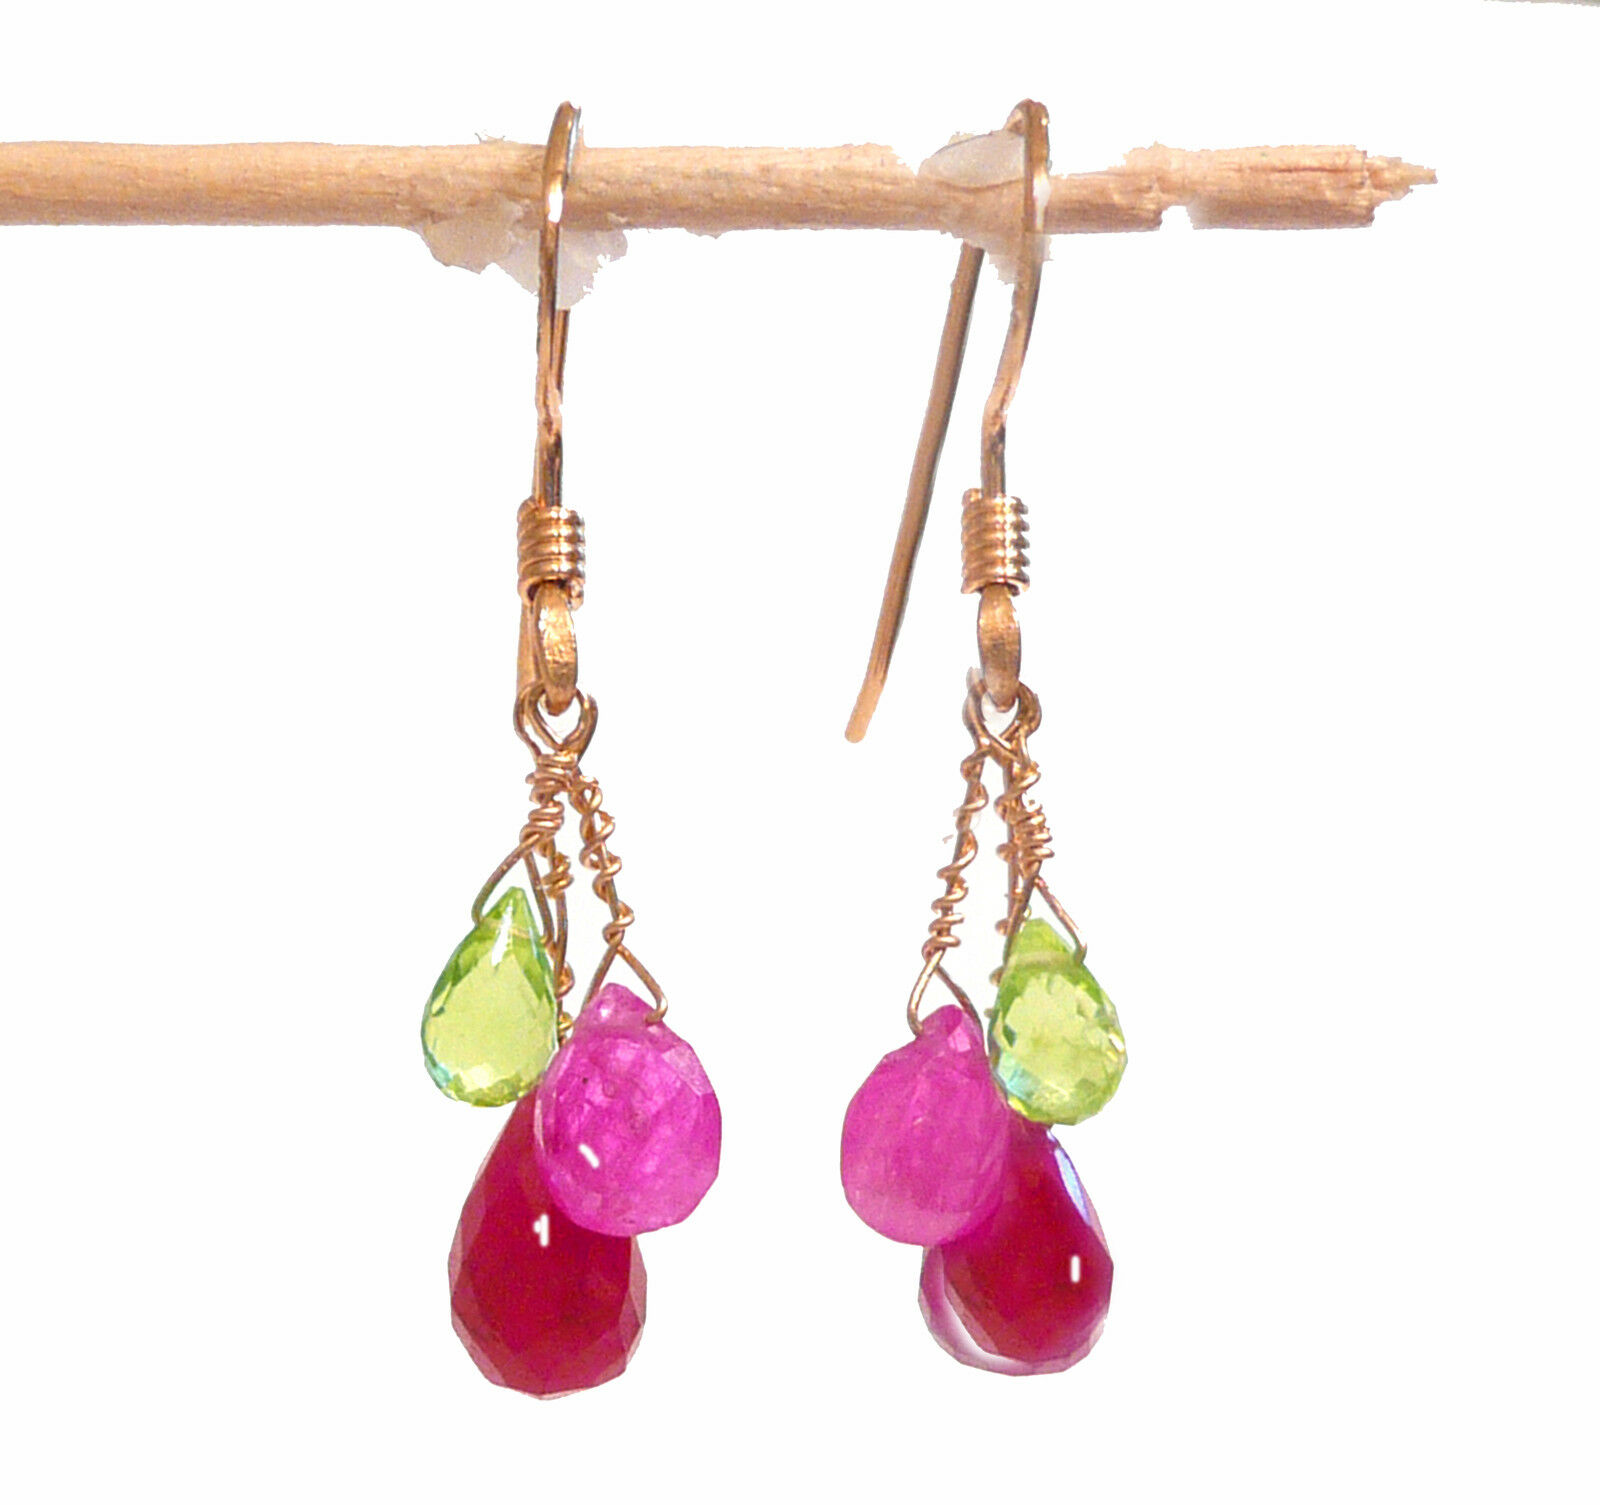 Real peridot pink sapphire ruby earrings 6ct briolettes teardrop 1.2  solid 14k